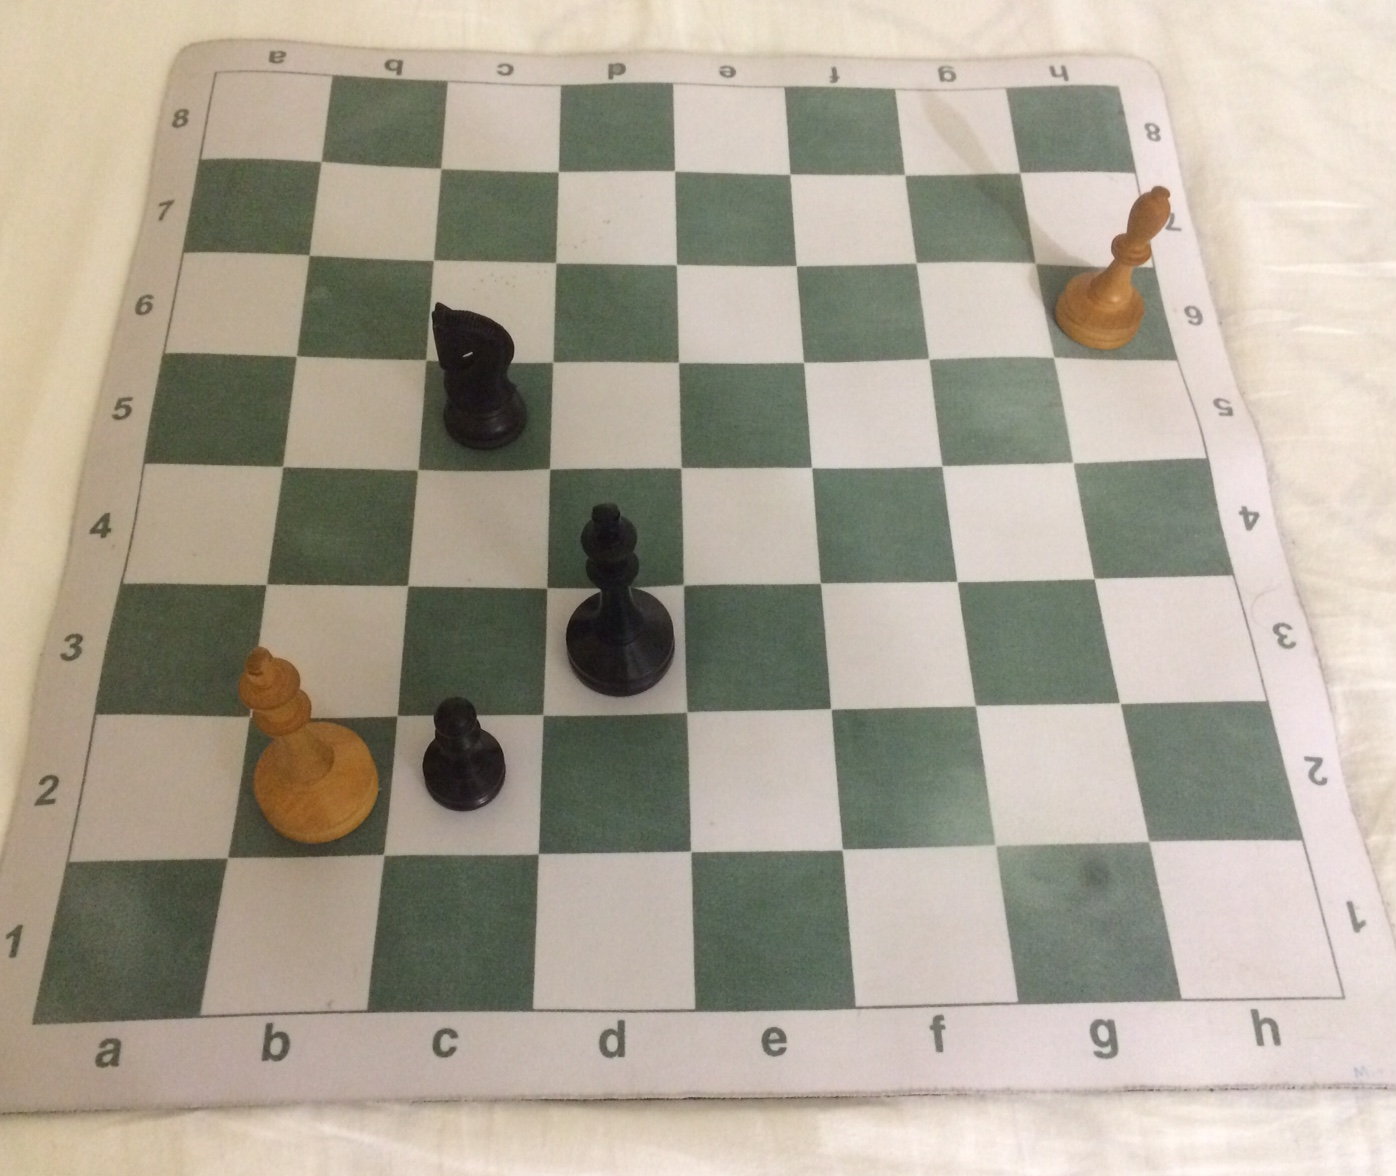 Altaya-napoleon-game chess-lead-king of prussia Frederic GUI III-new